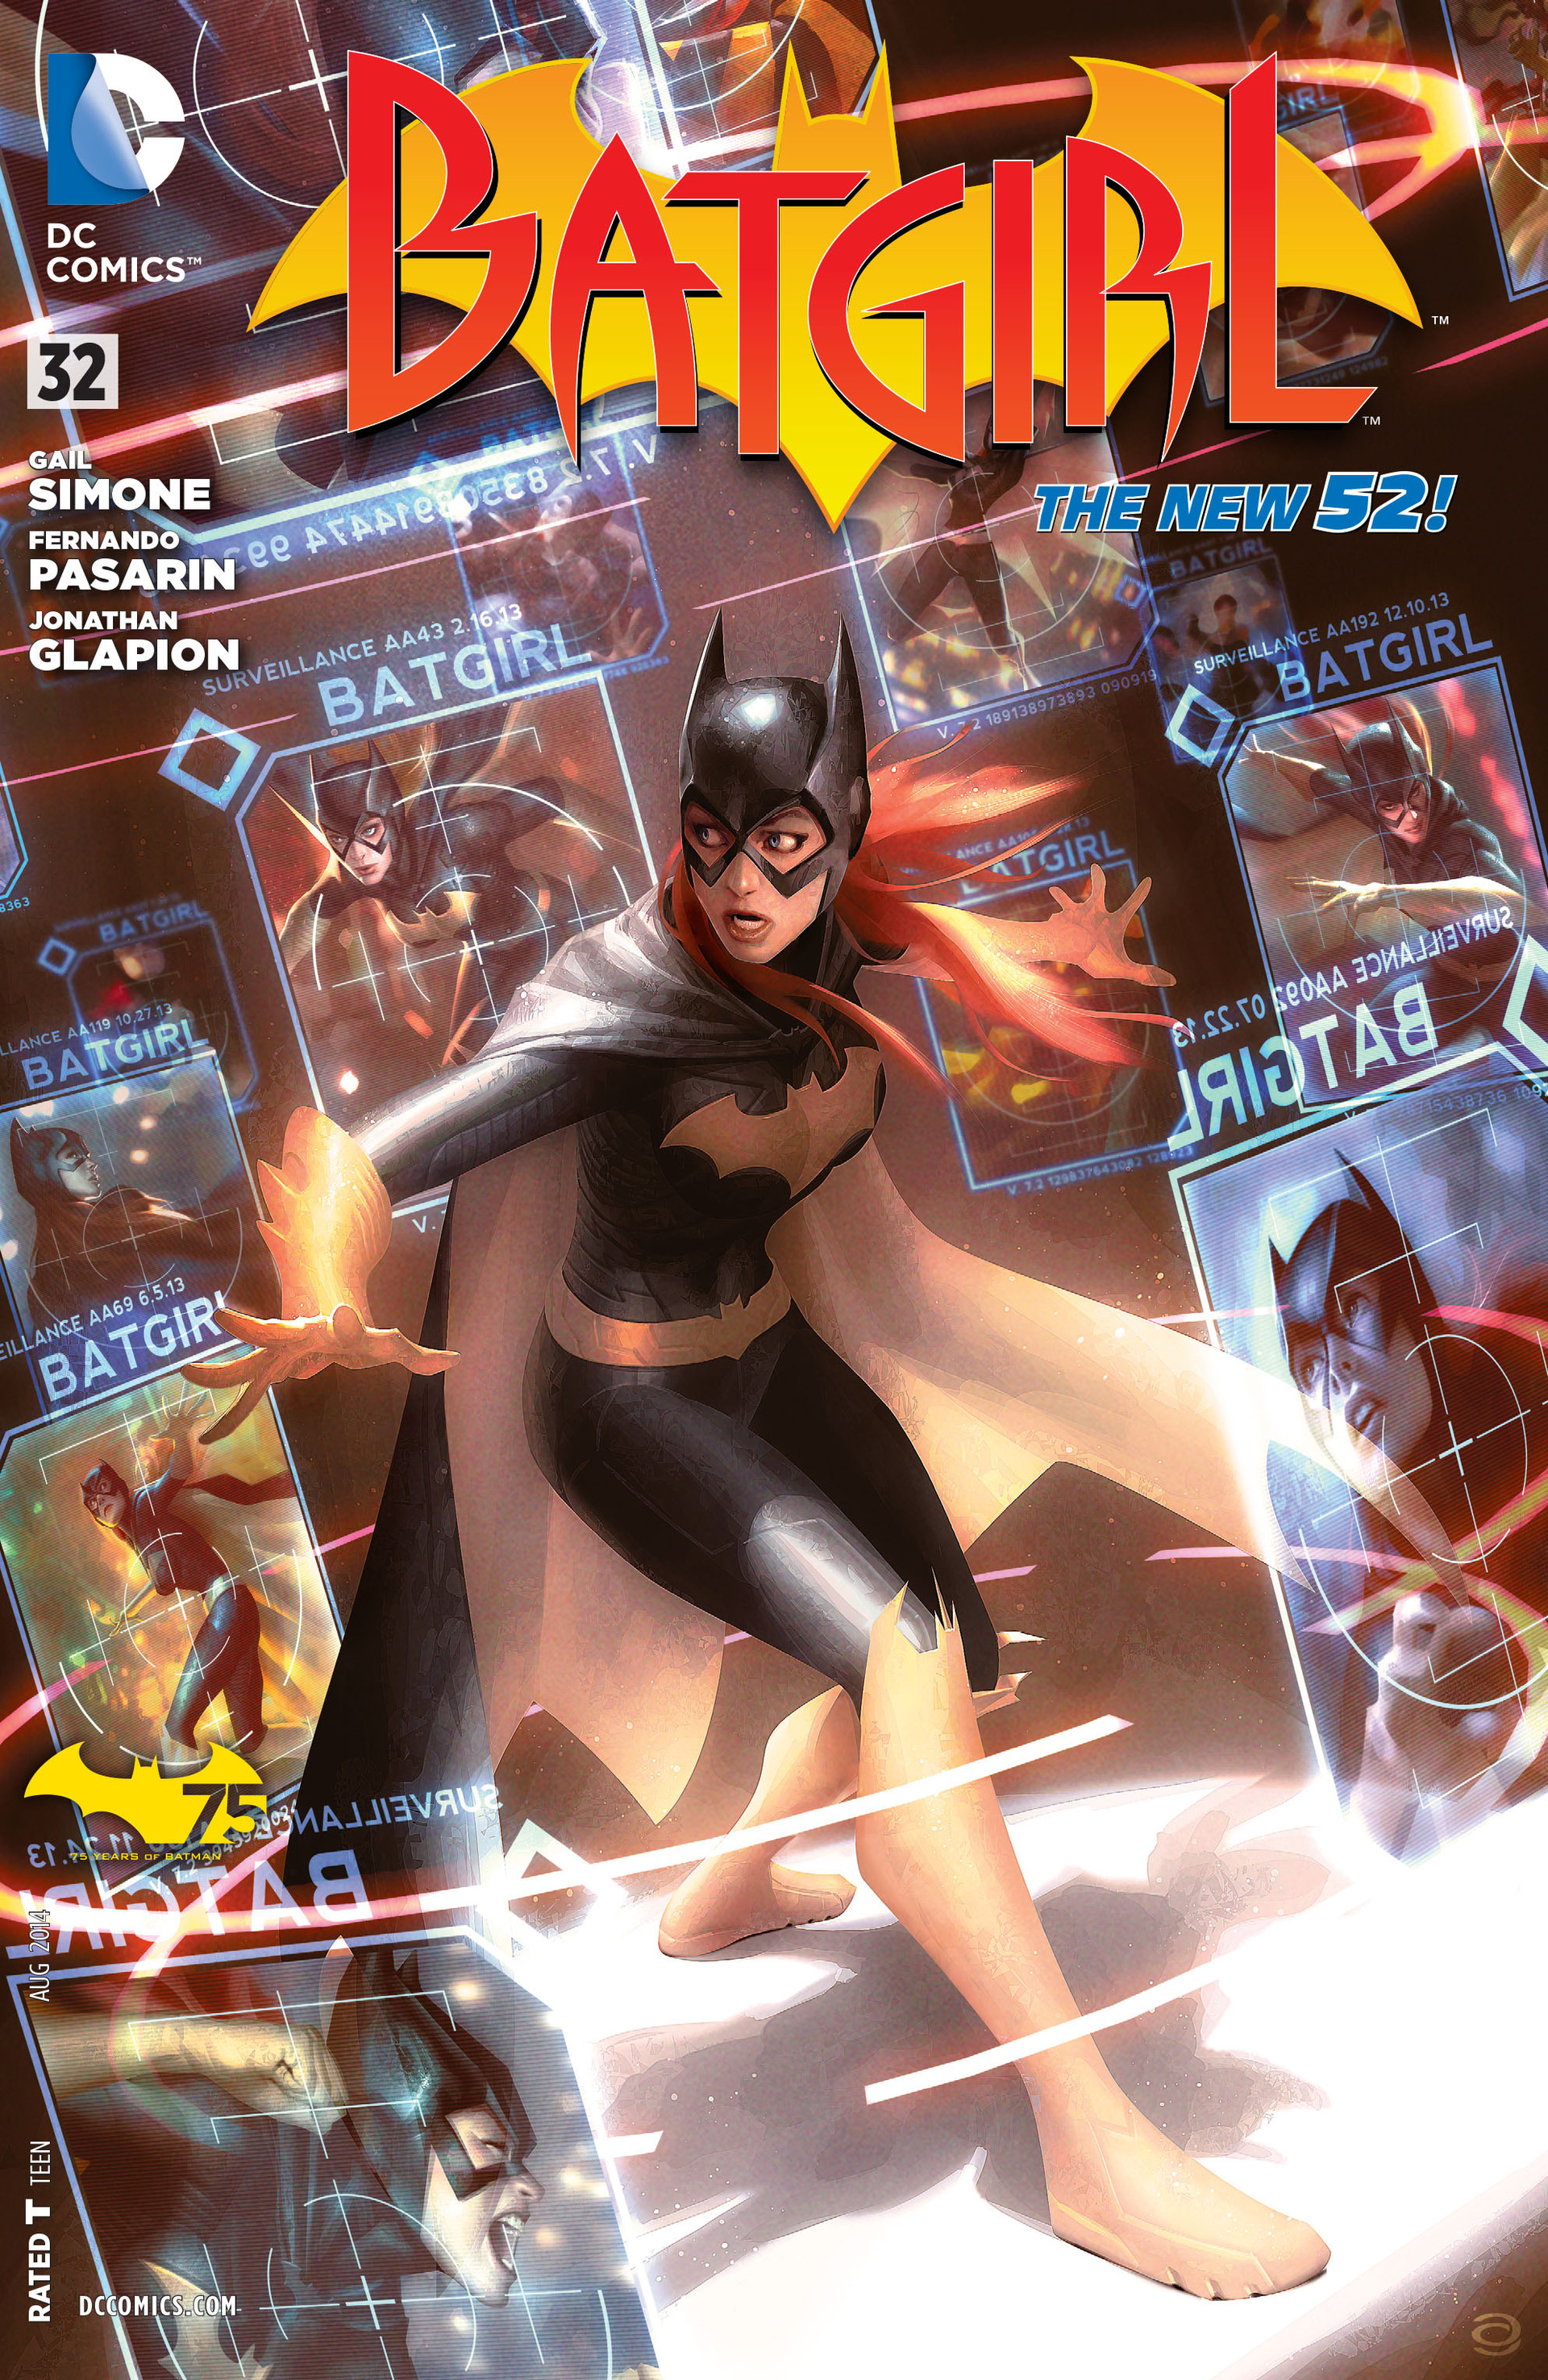 Batgirl Vol 4 32 | DC Database | FANDOM powered by Wikia